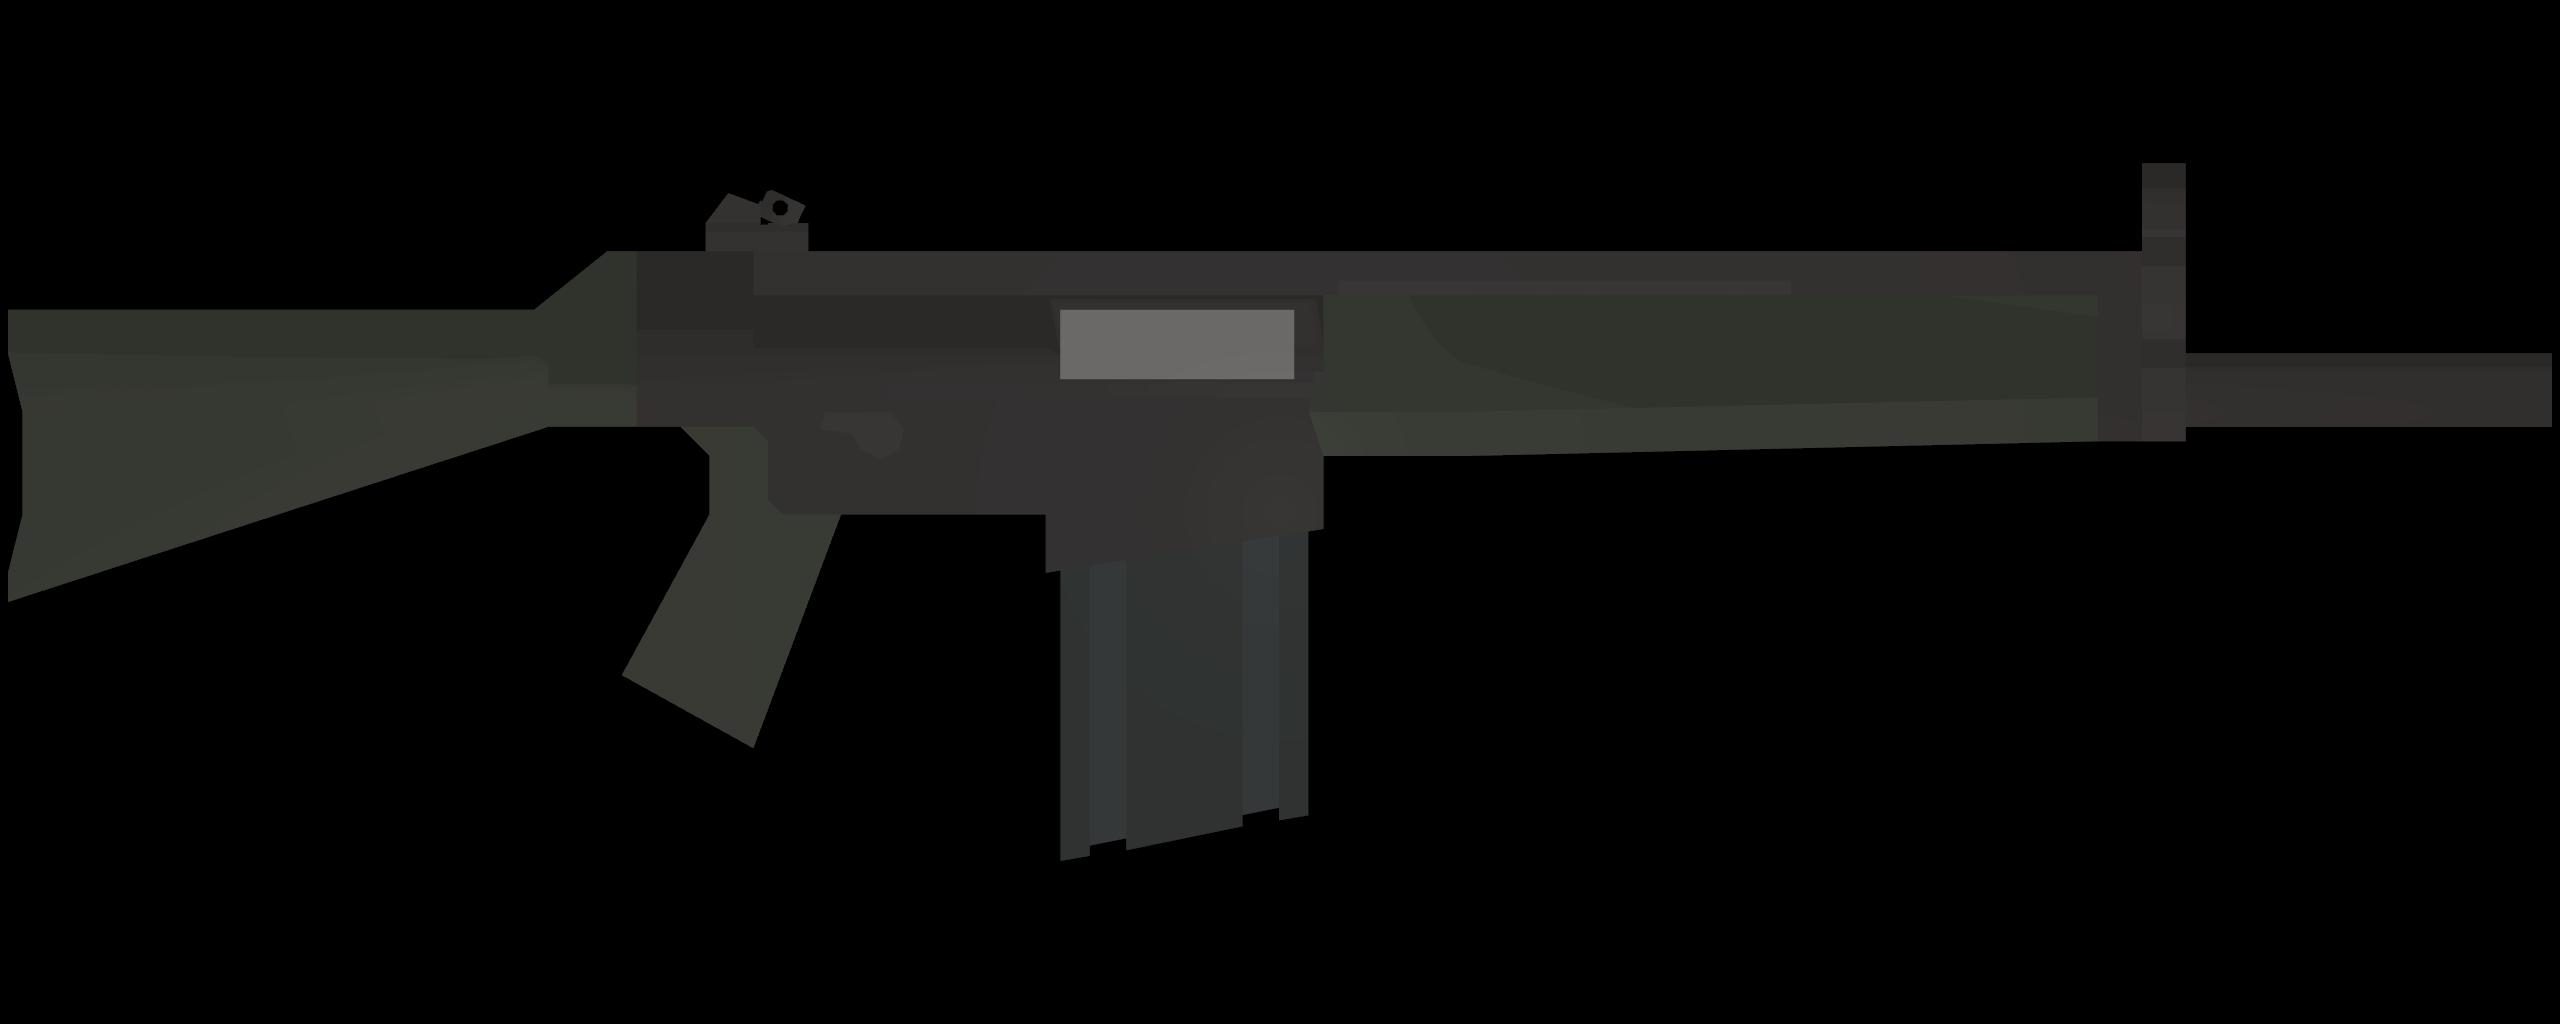 Unturned Uncreated Warfare Mods & All ID List + Attachments - Neutral Weapons - ECC9B95